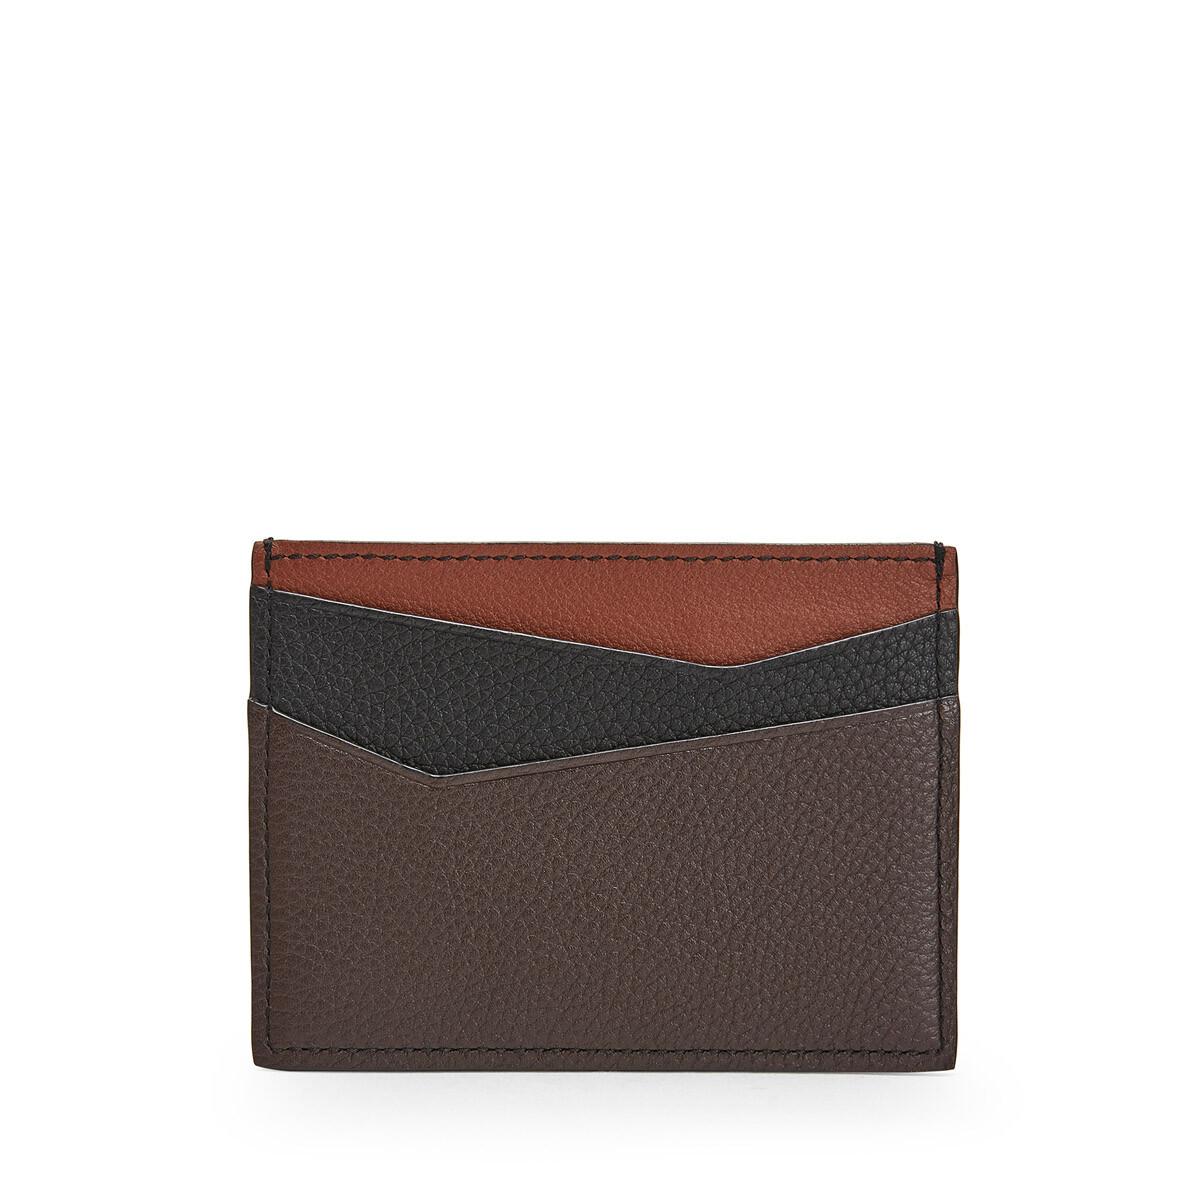 LOEWE Puzzle Plain Cardholder Cognac/Chocolate Brown front